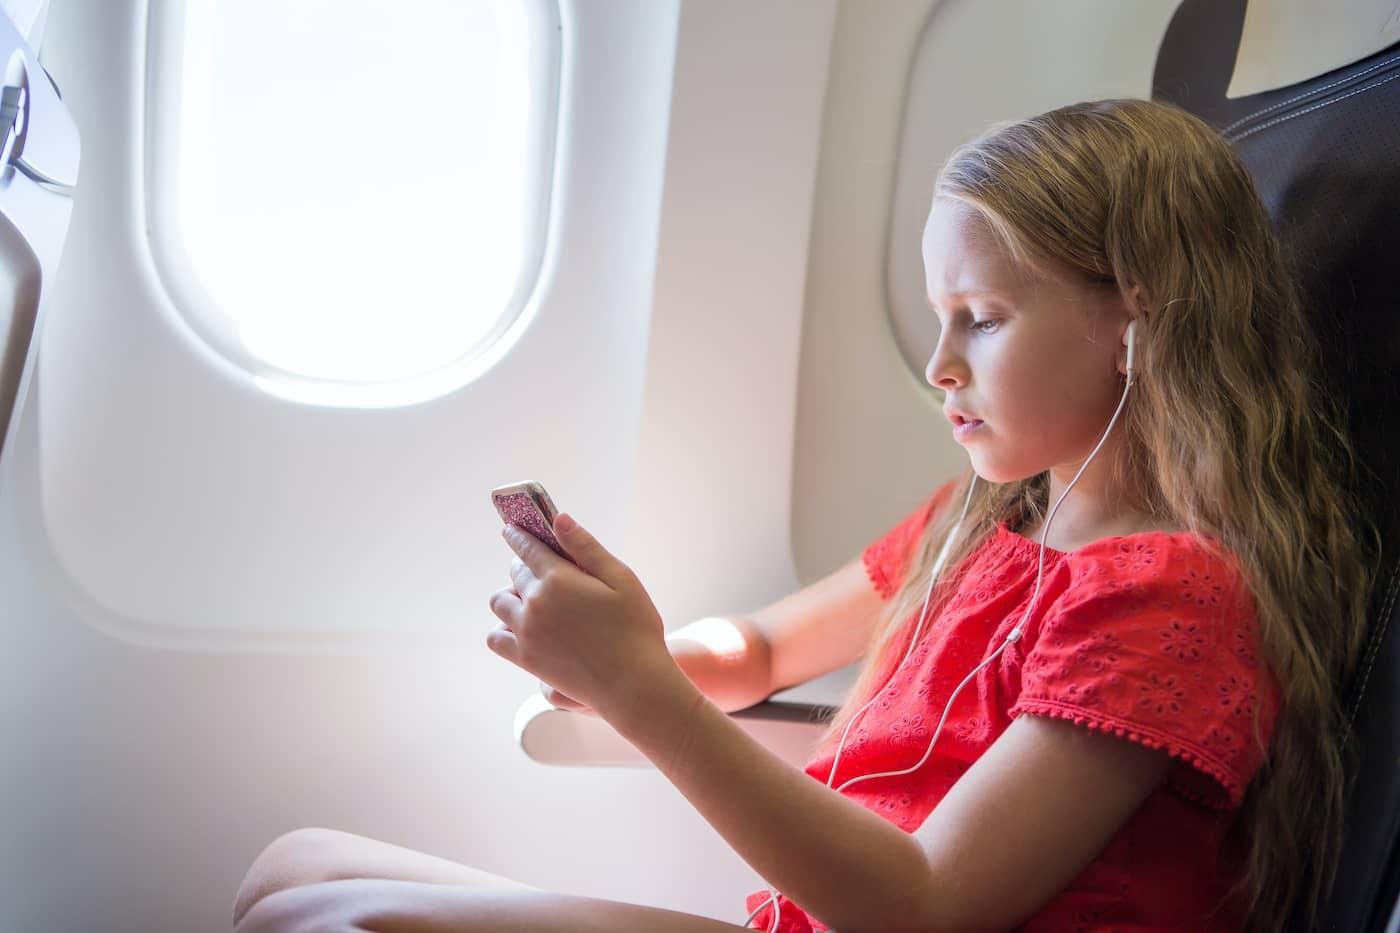 headphones kid flight